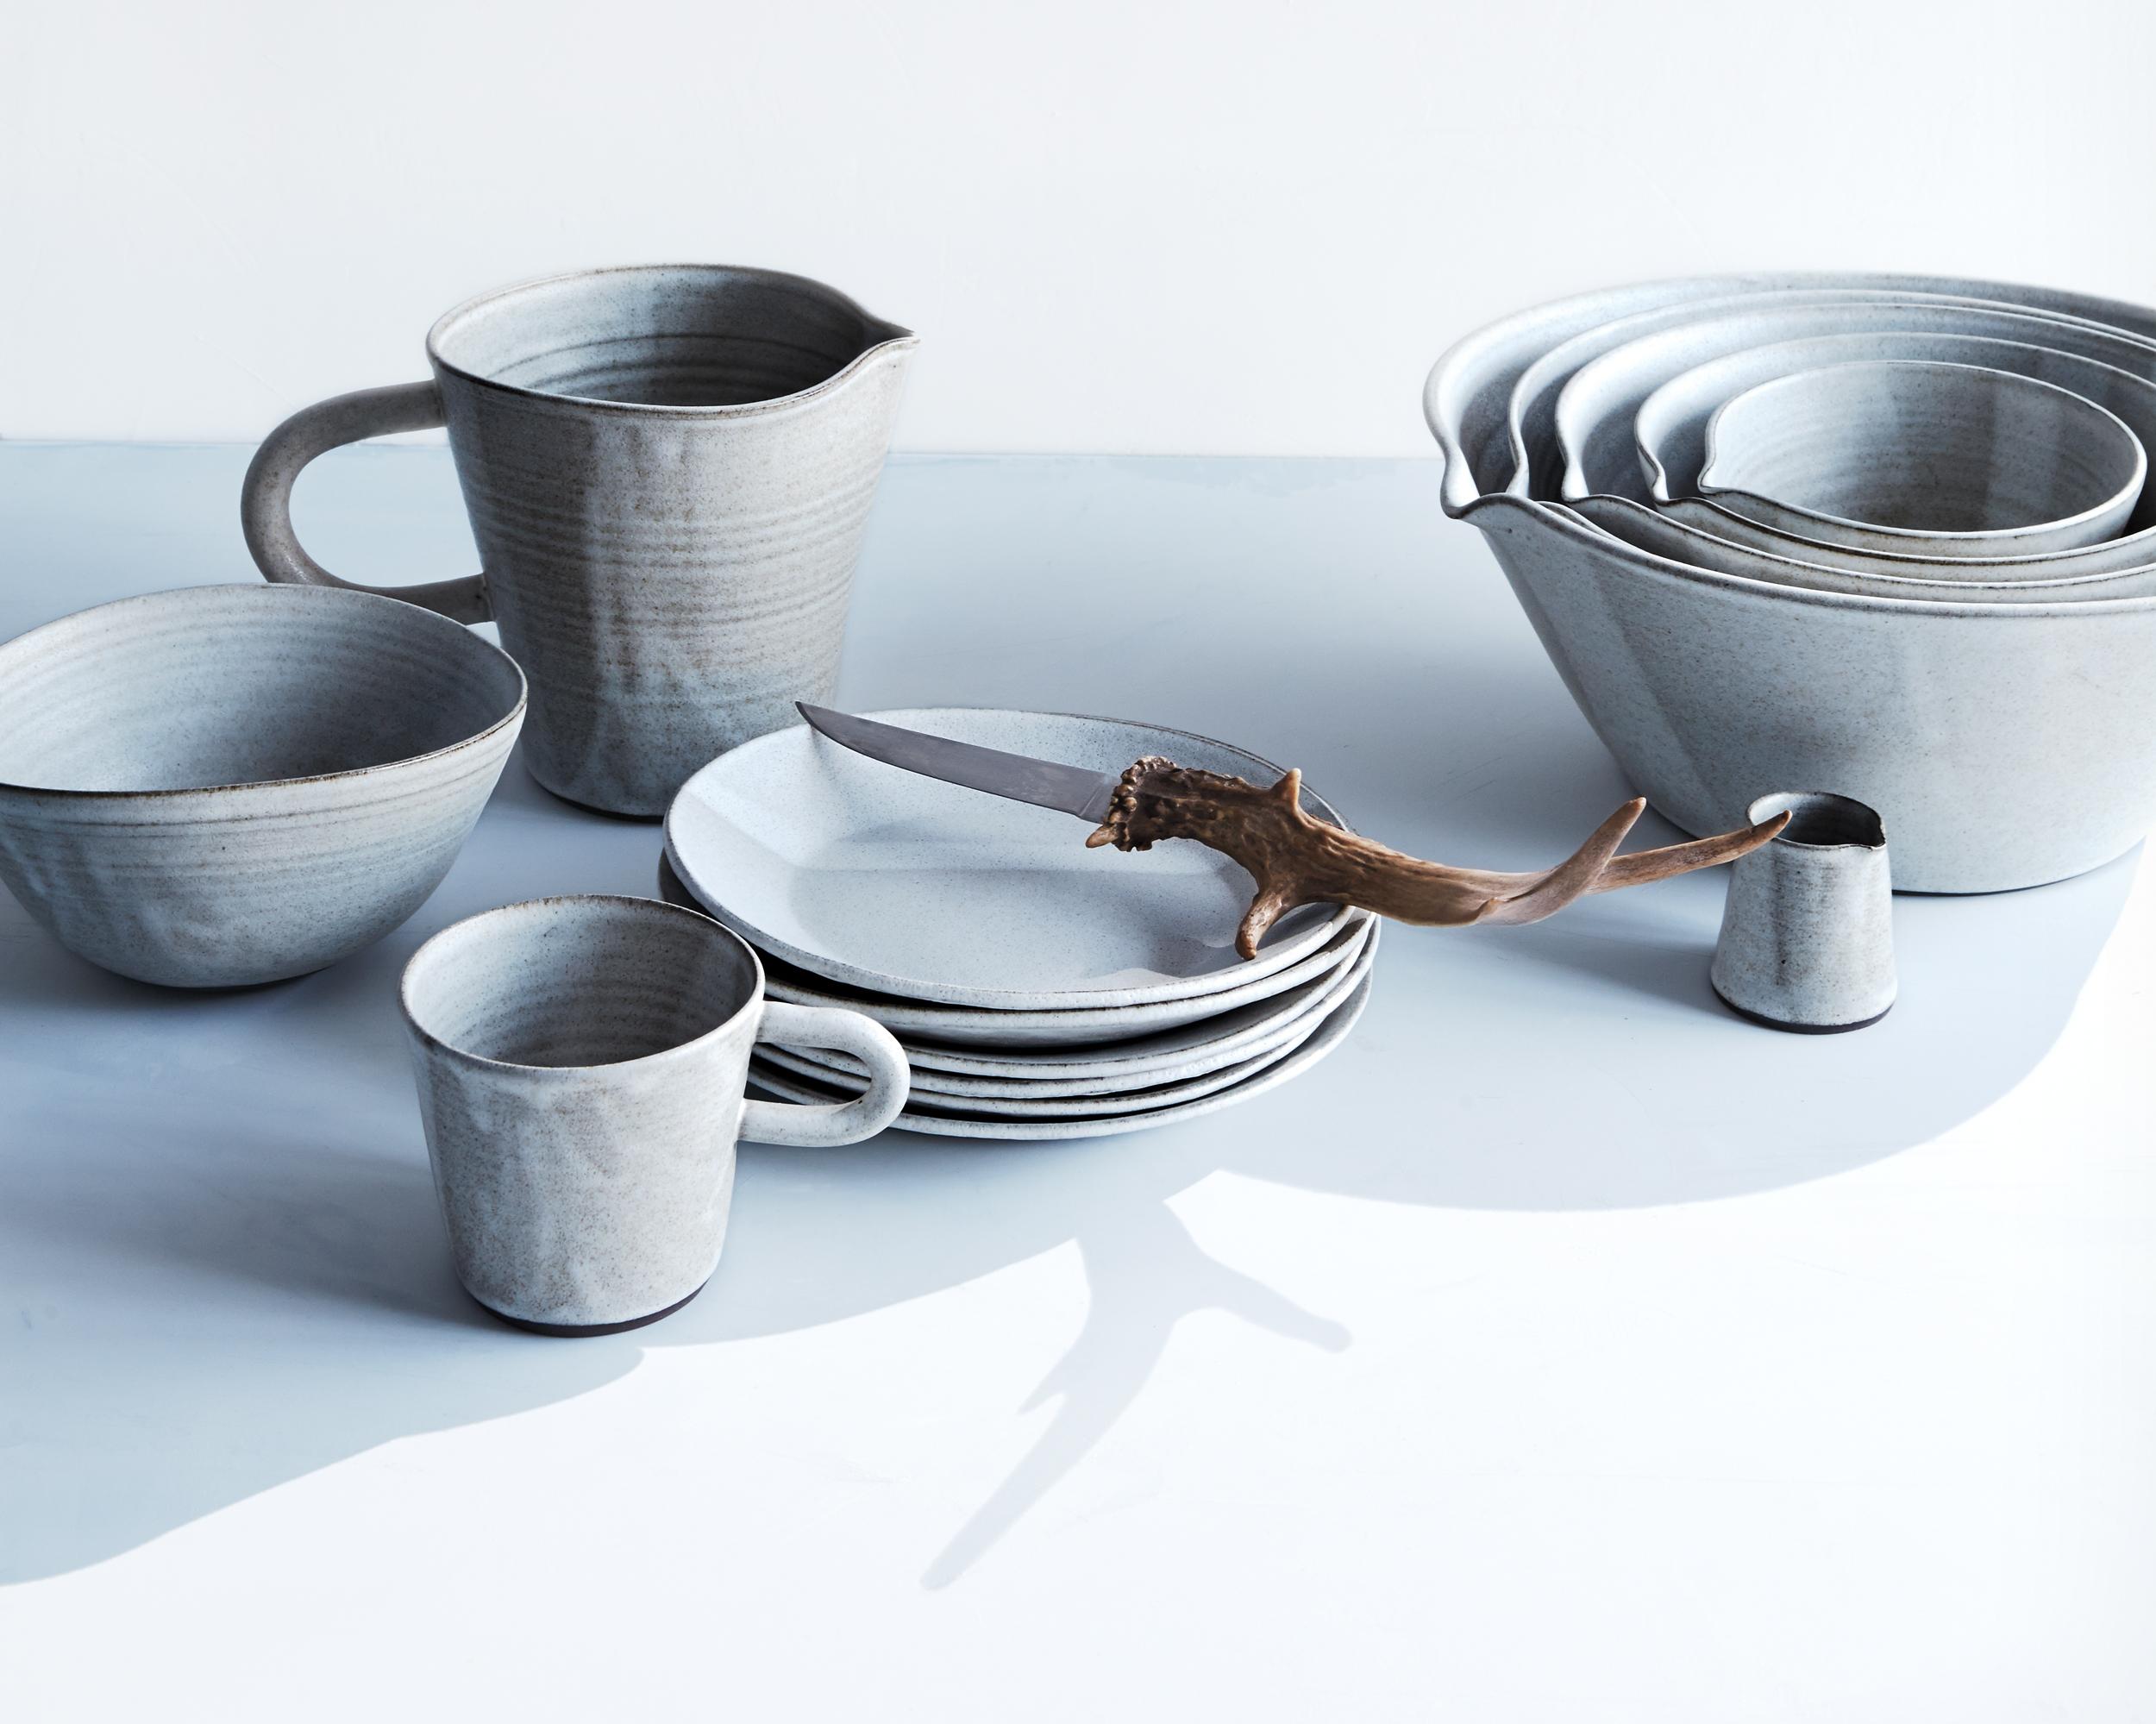 cropMstill-life-ceramics-eric-022-d111084.jpg